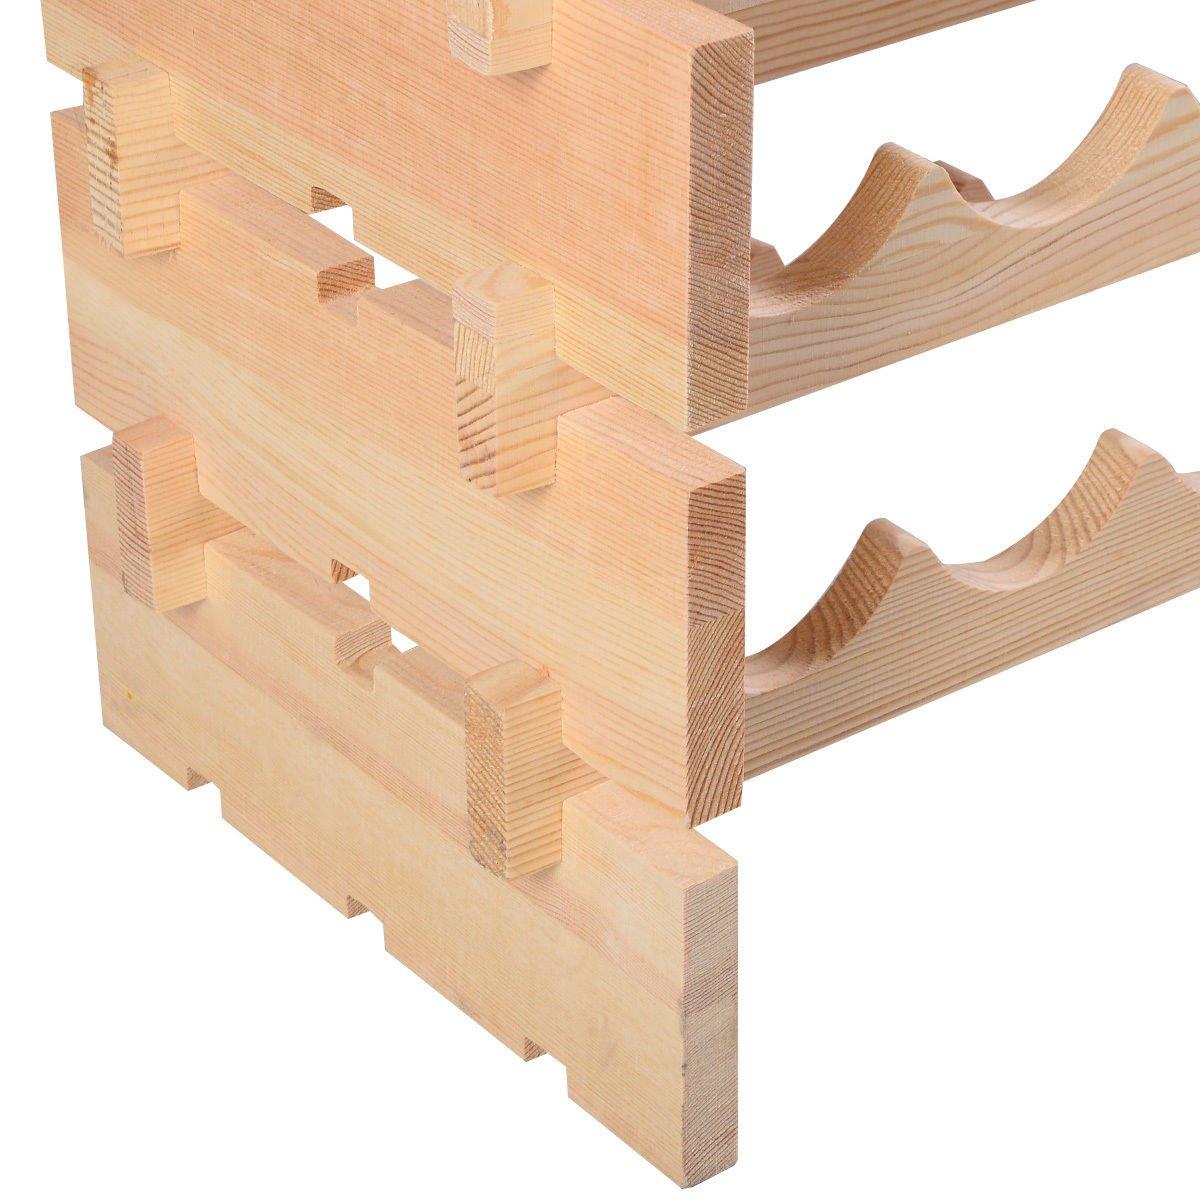 6 Tier Pinewood Wine Rack Natural Display Storage Shelves fit 72 Bottle by FDInspiration (Image #5)